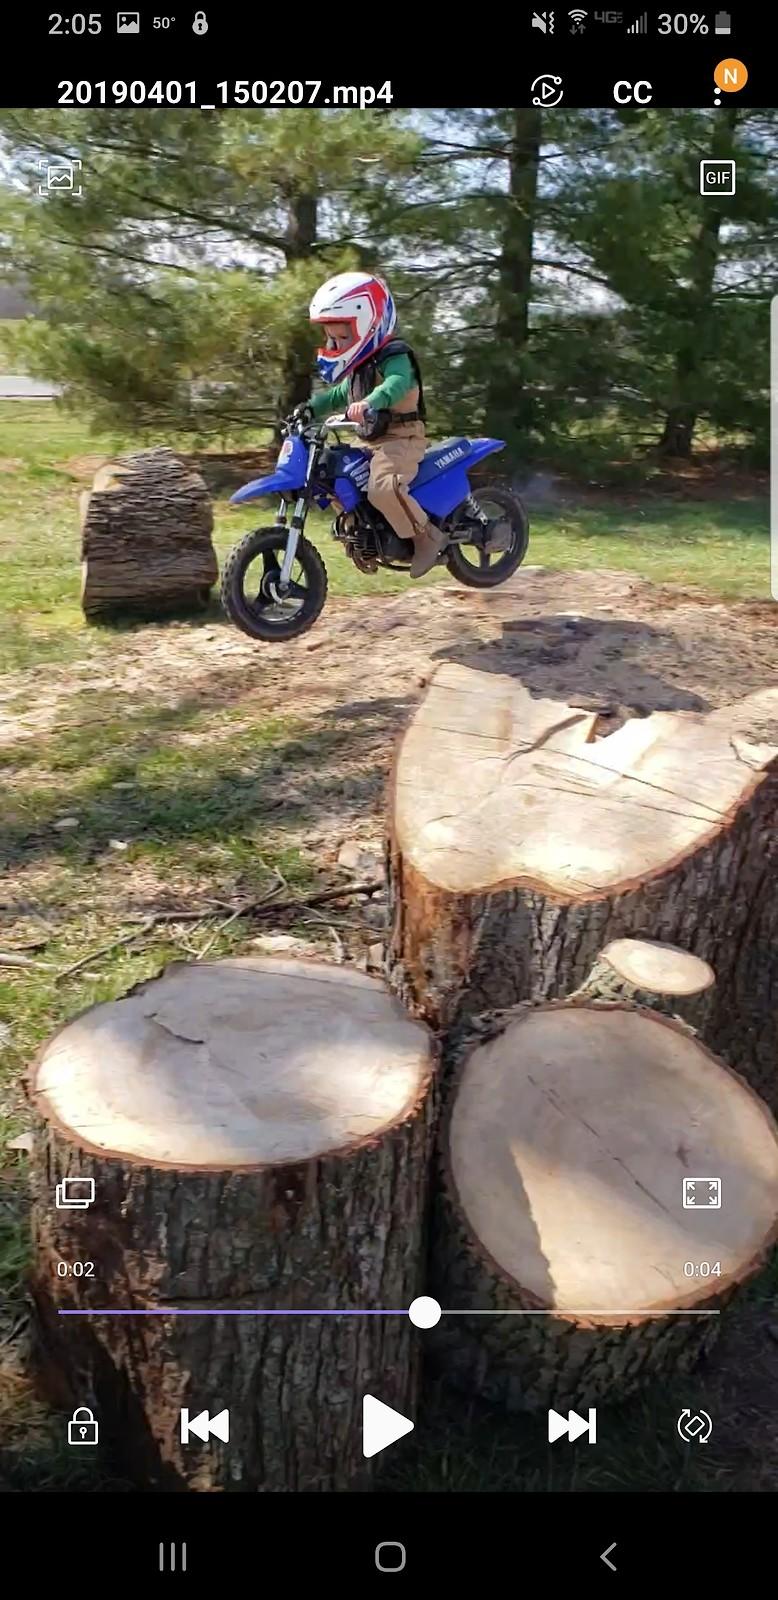 Jake's last ride on Yamaha pw50 - JkF2014** - Motocross Pictures - Vital MX